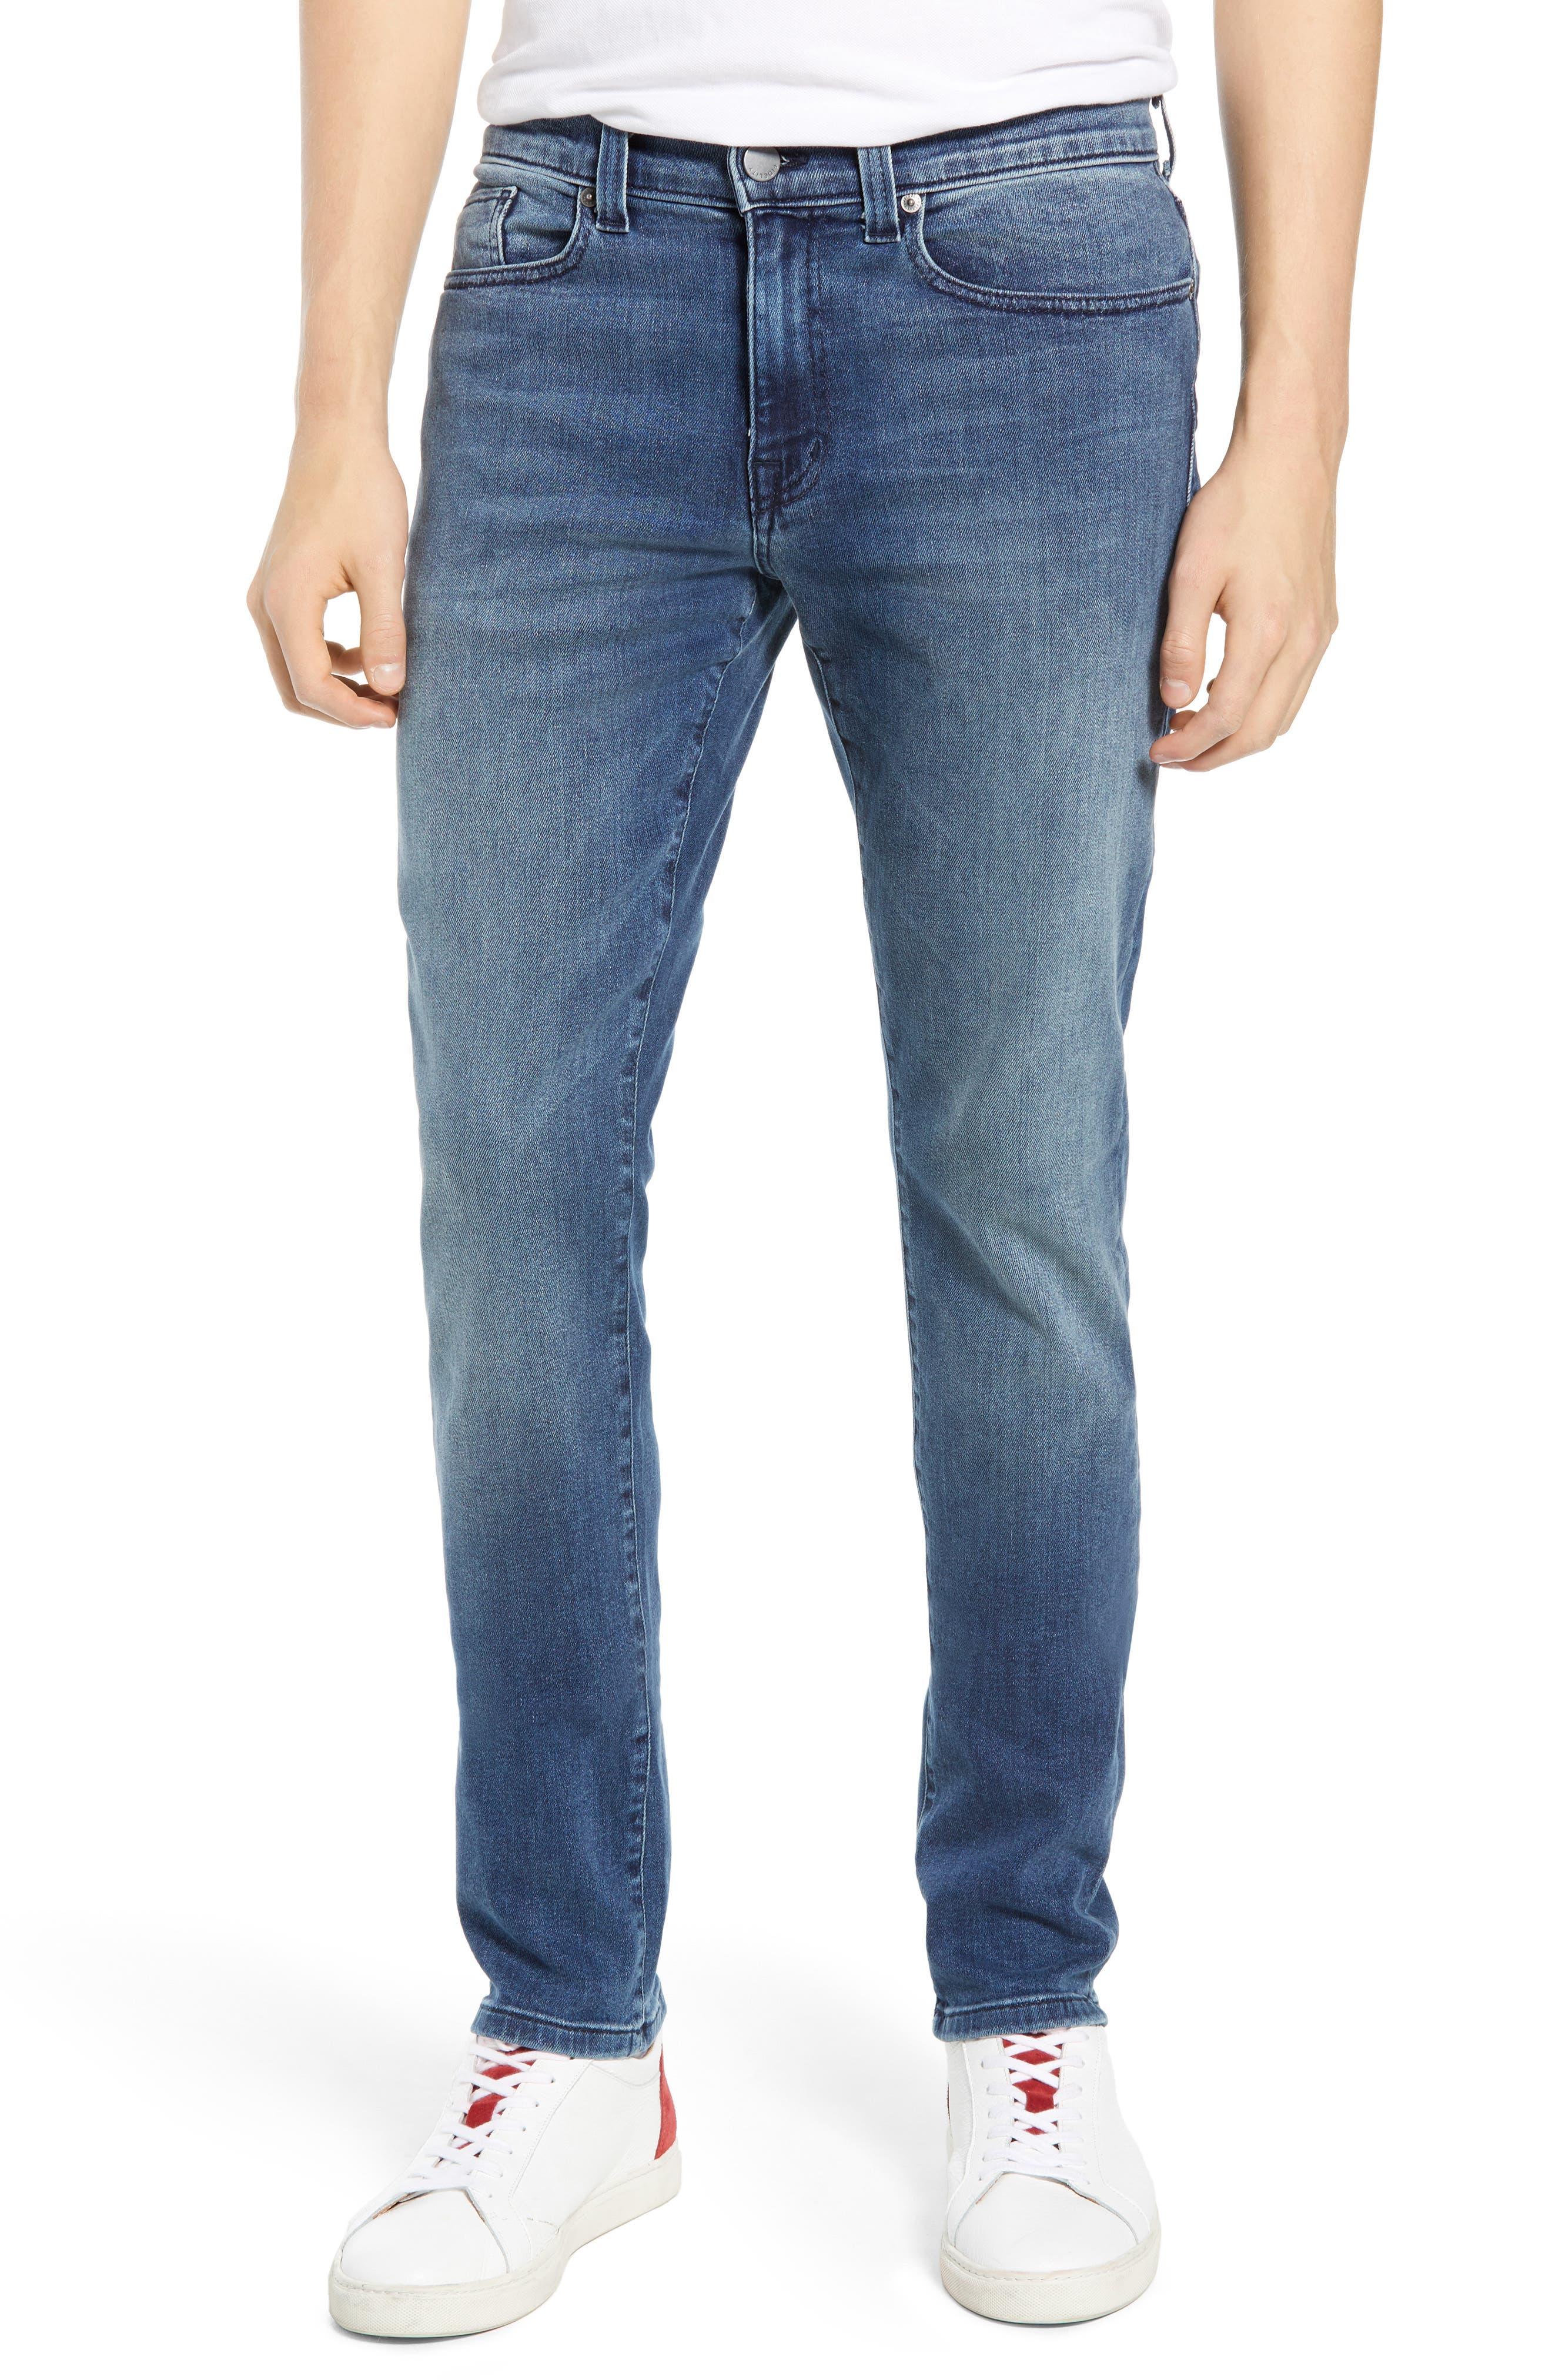 Torino Slim Fit Jeans,                             Main thumbnail 1, color,                             EMPIRE BLUE